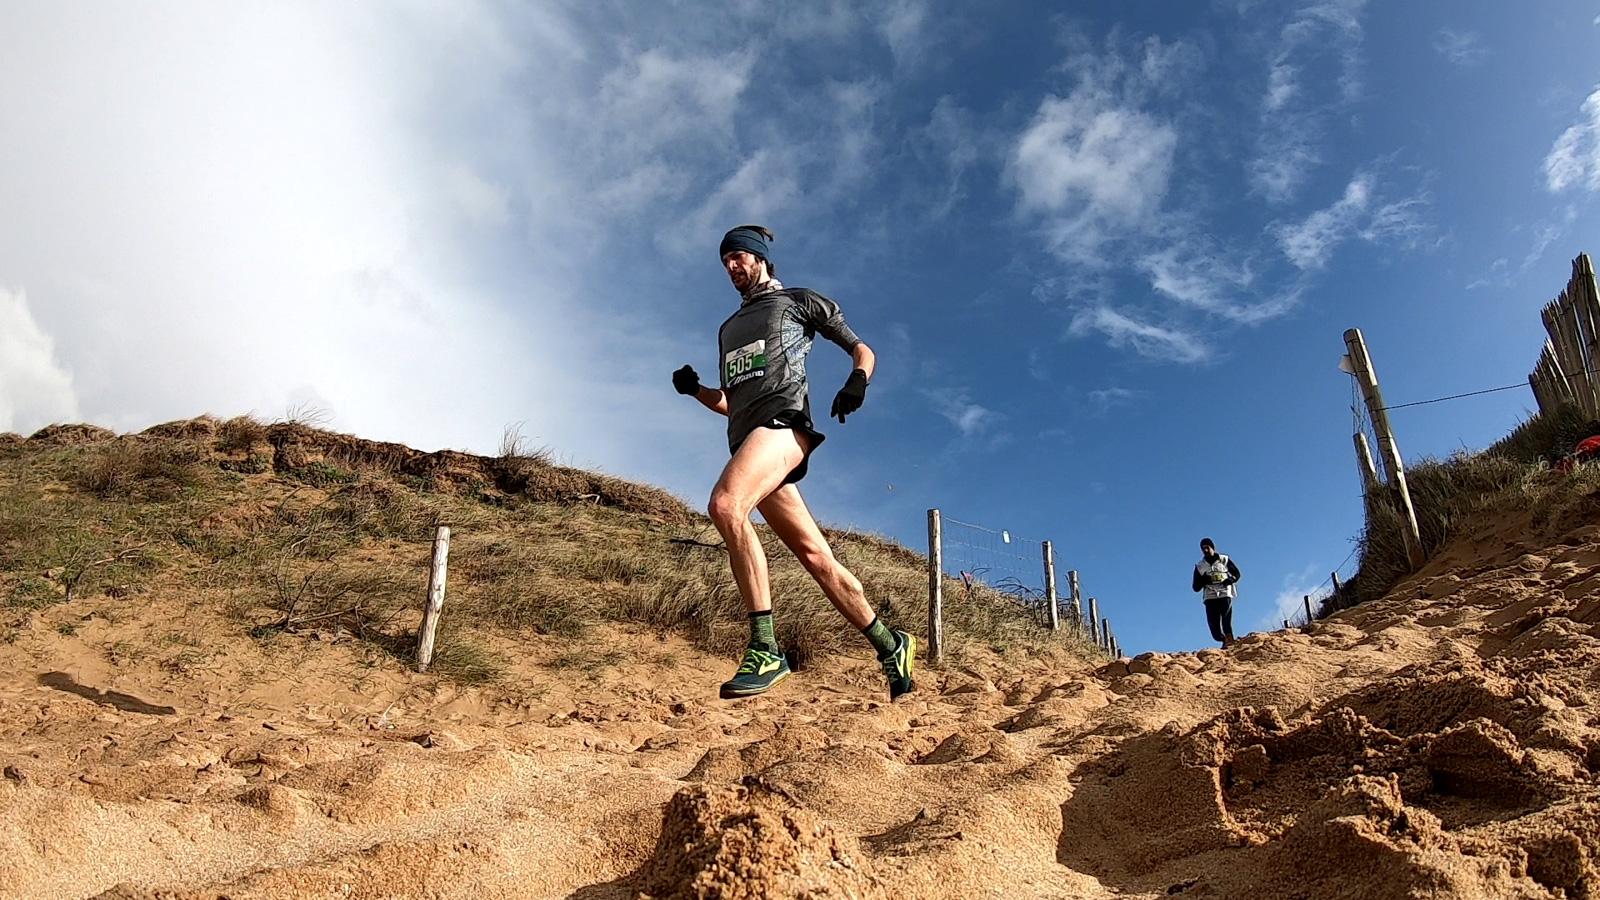 activites-sport-nature-Trail-vendee-michel-arnaud-course-dune